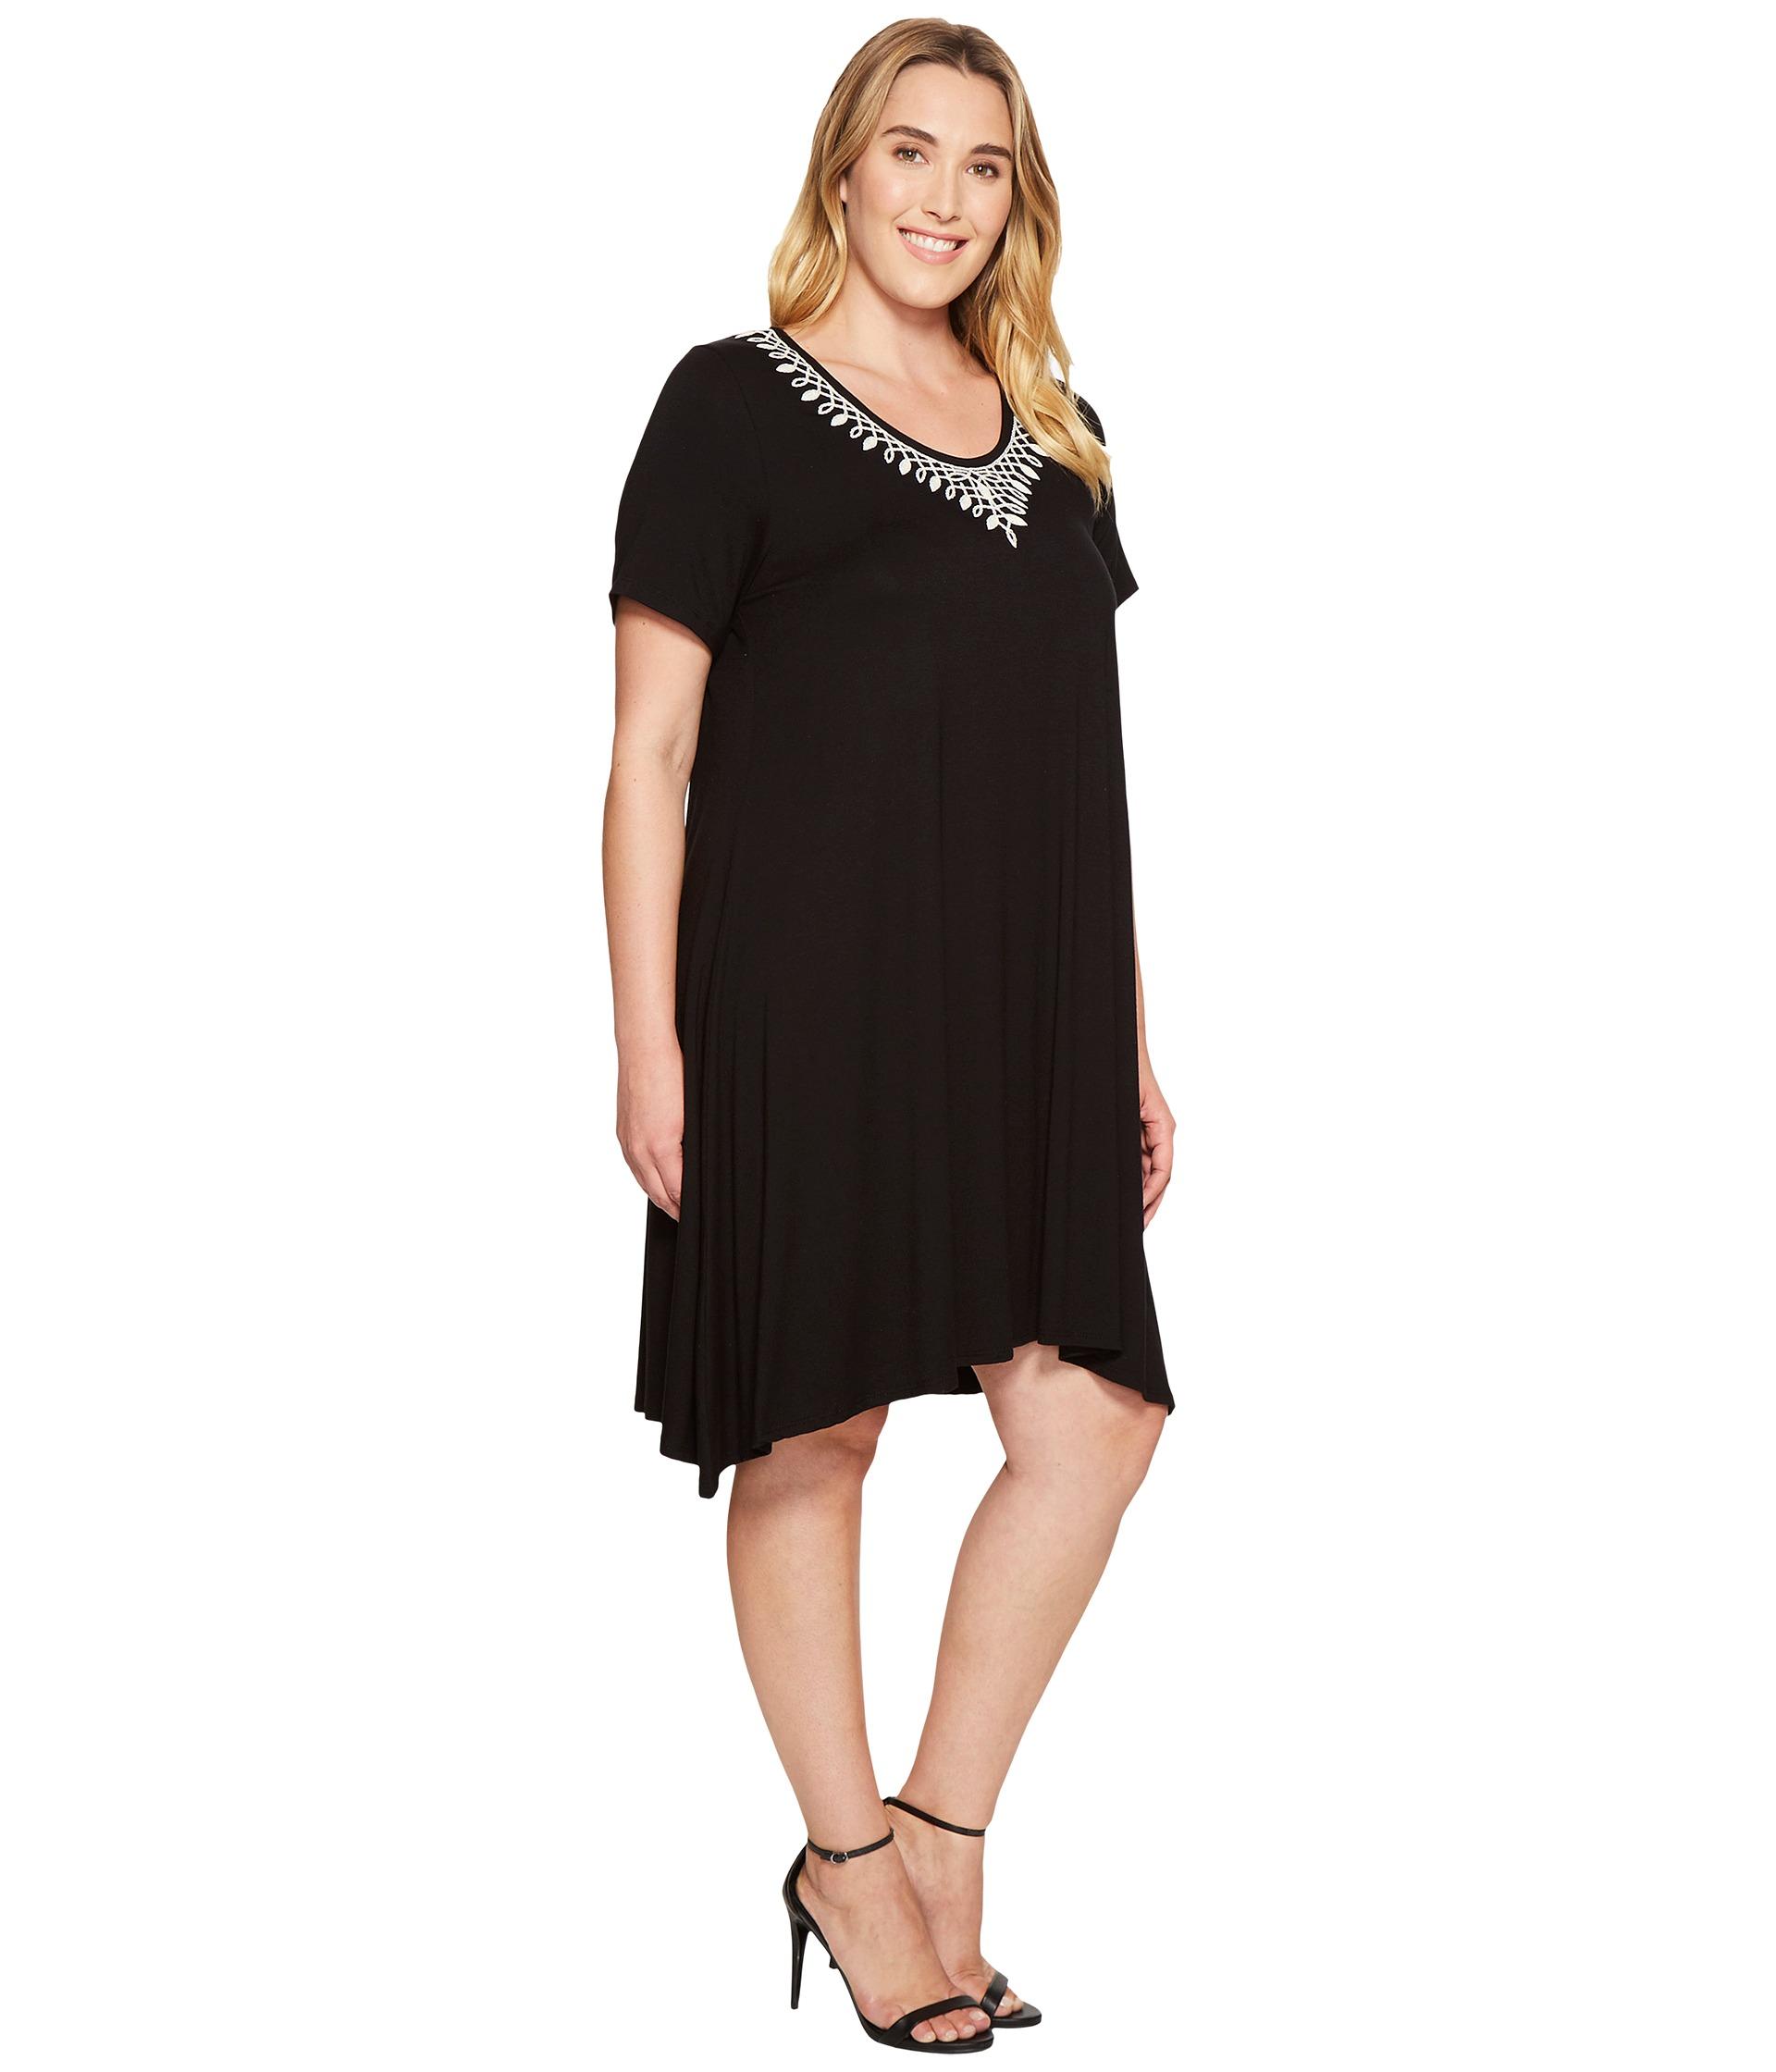 Karen kane plus plus size embroidered handkerchief dress for Handkerchief shirt plus size